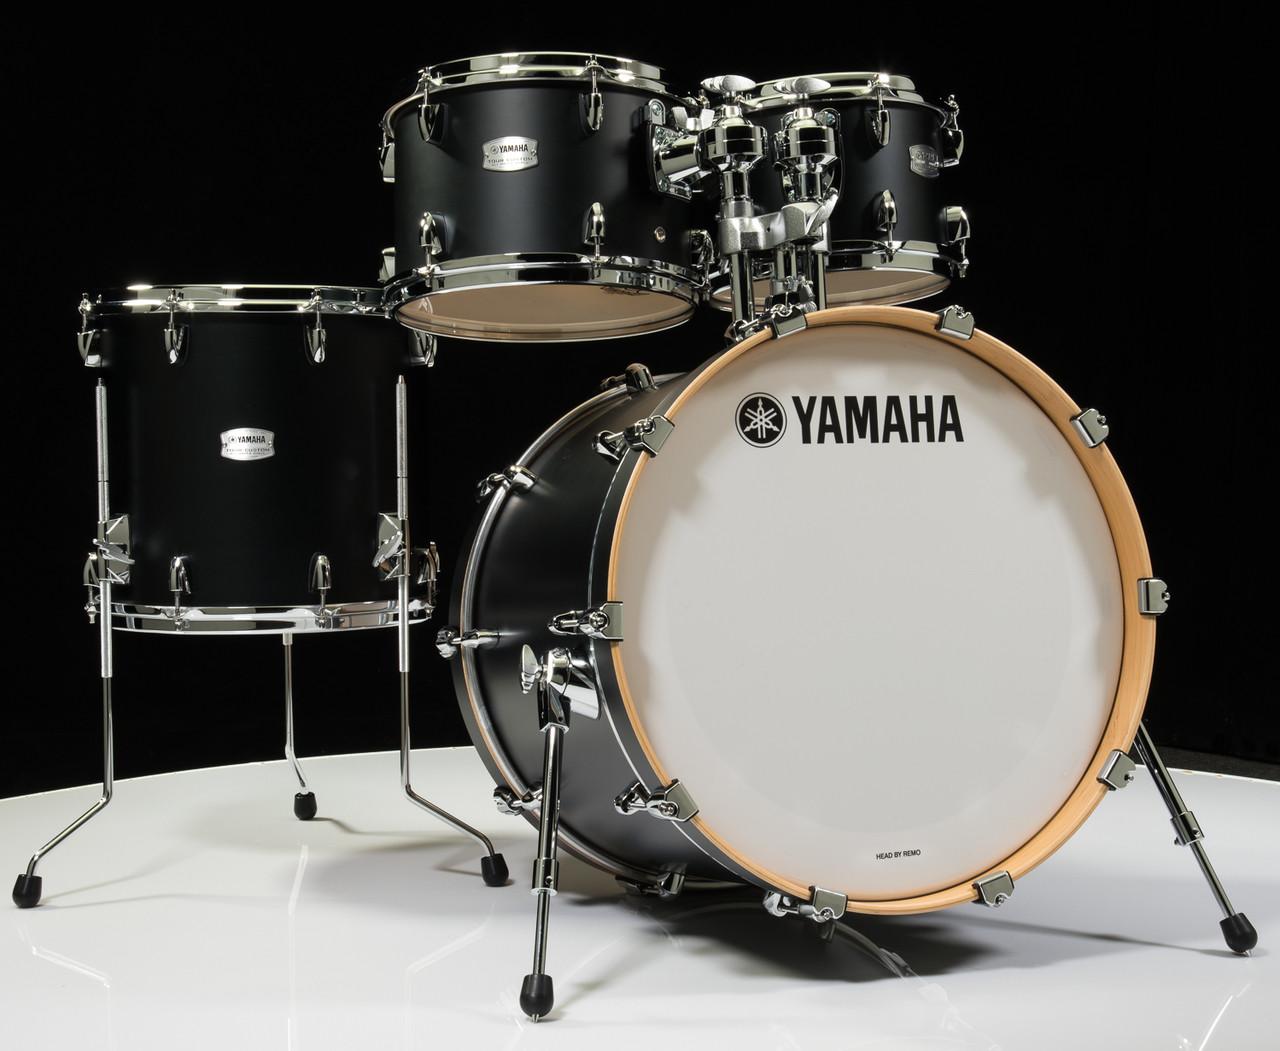 yamaha tour custom 4pc shell pack 10 12 14 20 licorice satin. Black Bedroom Furniture Sets. Home Design Ideas